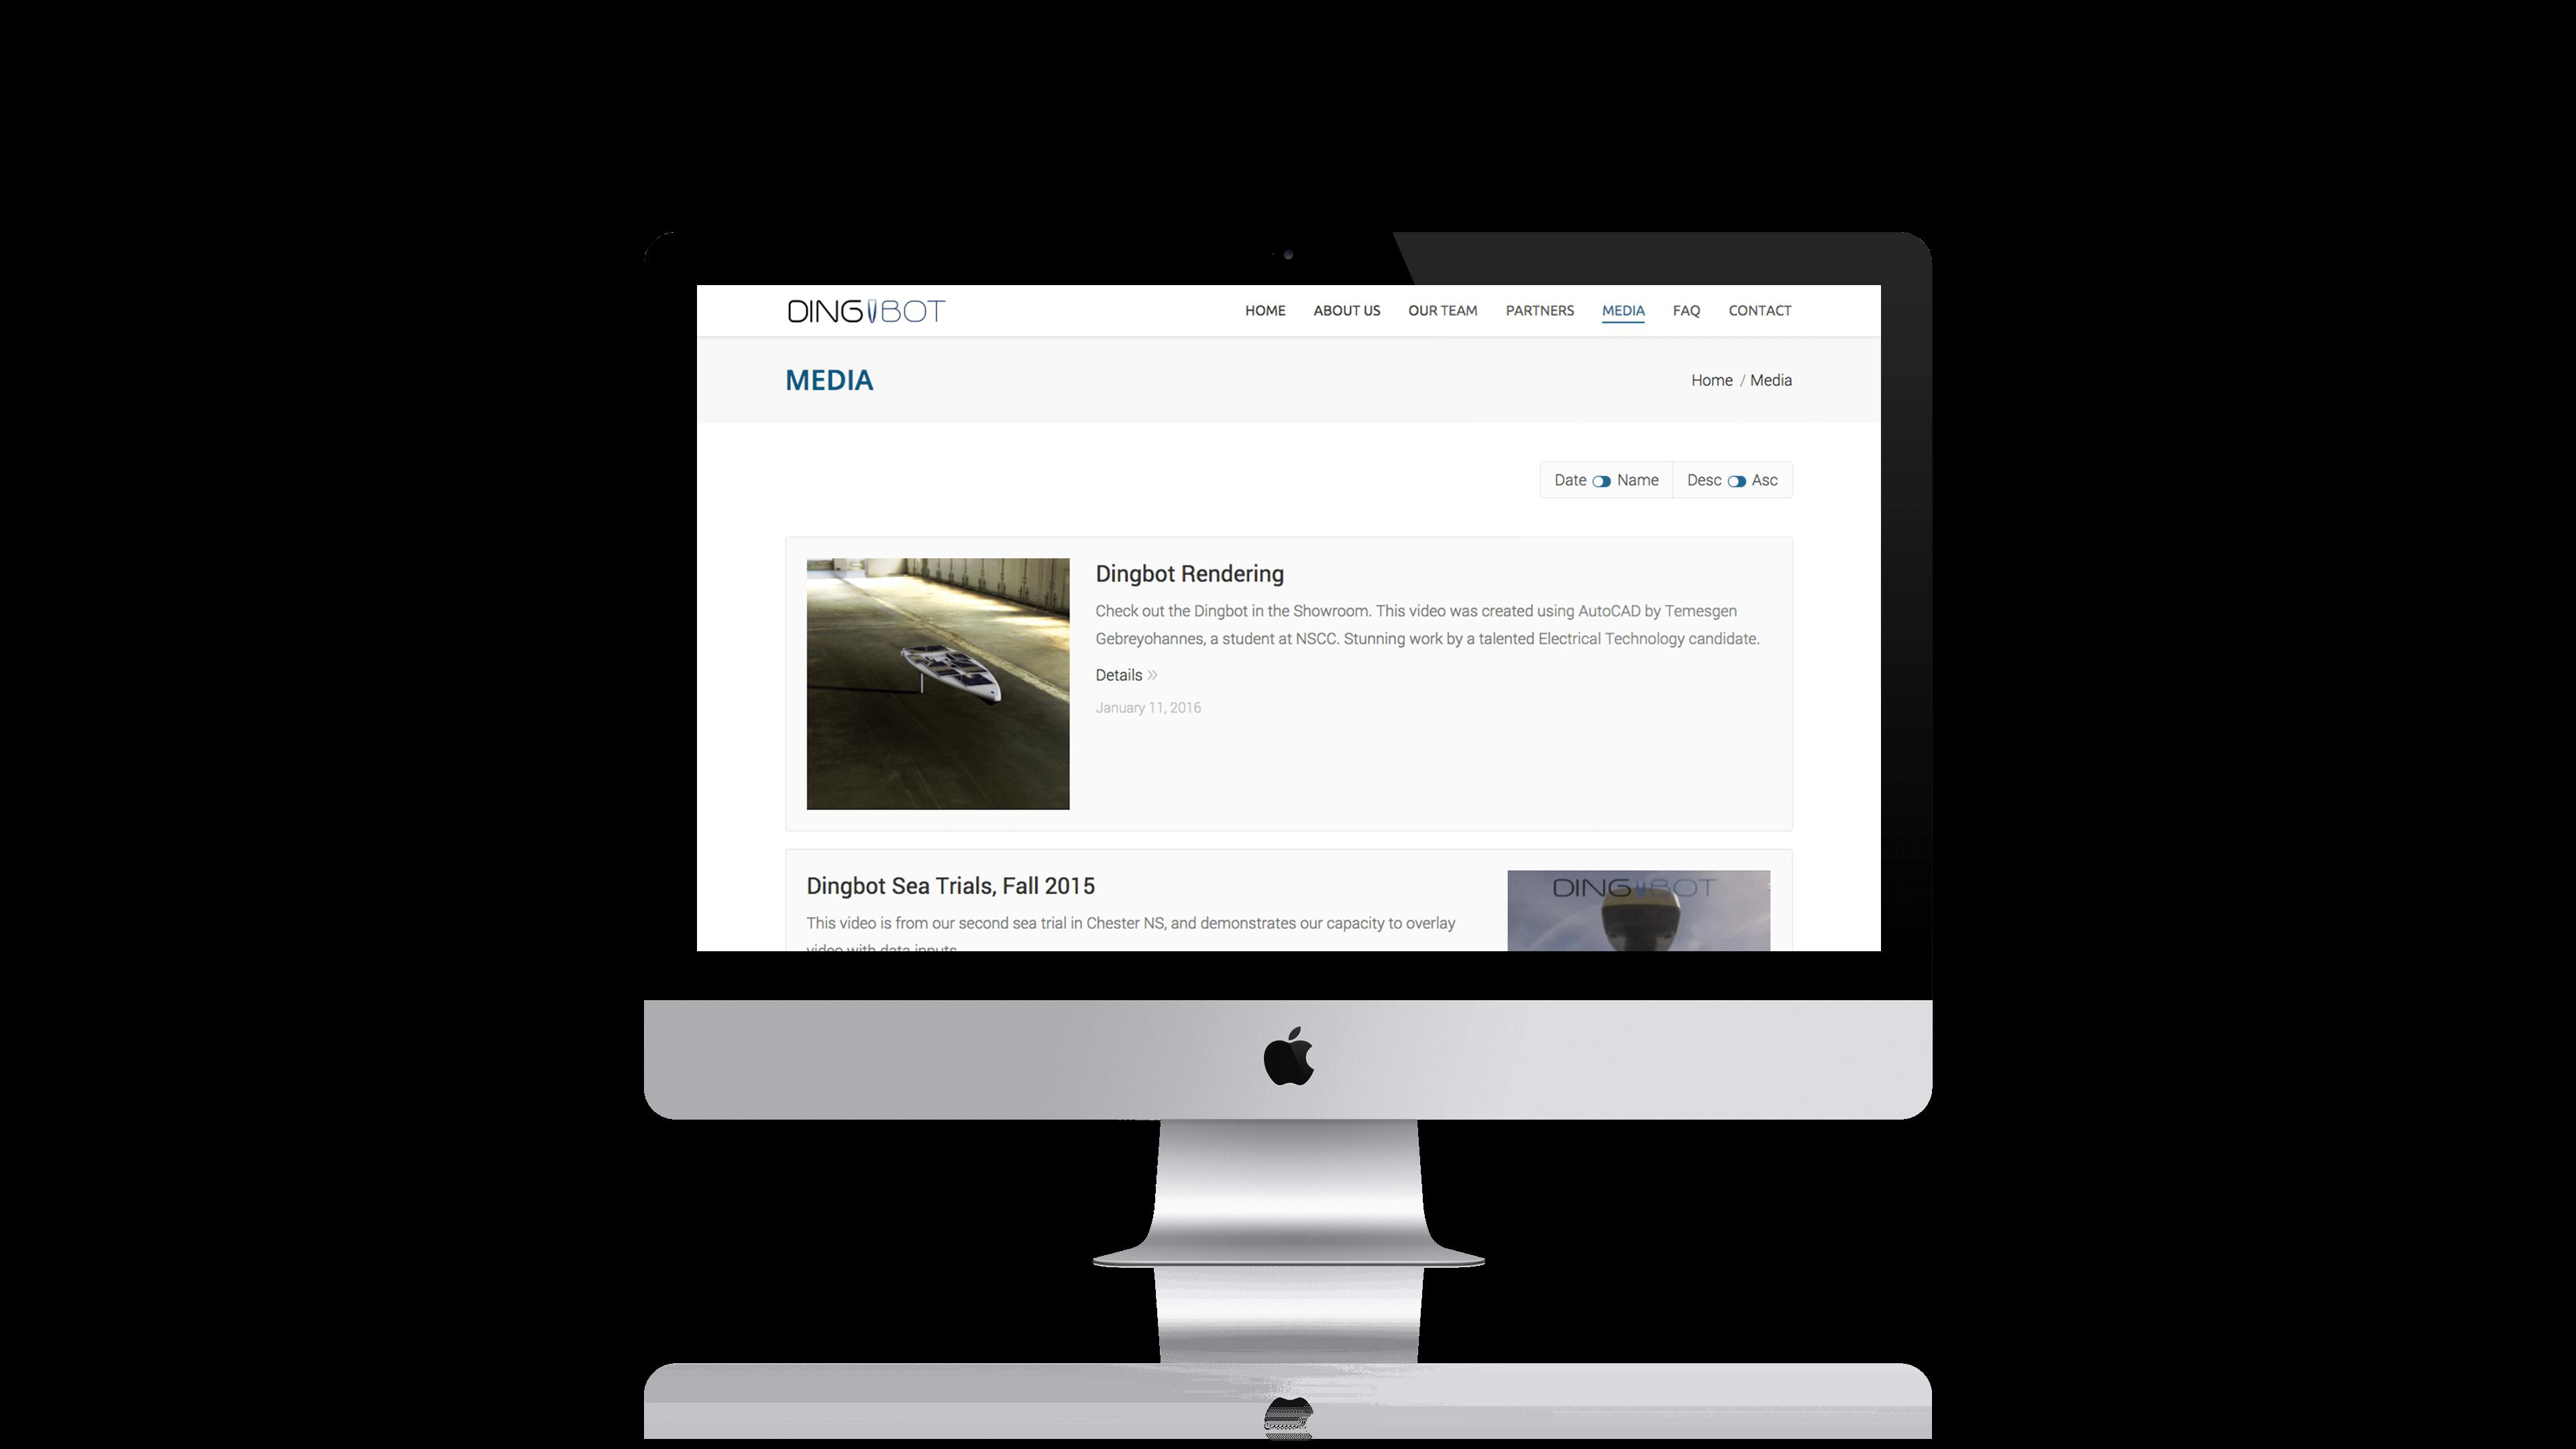 Dingbot Responsive Website Design by Pivot